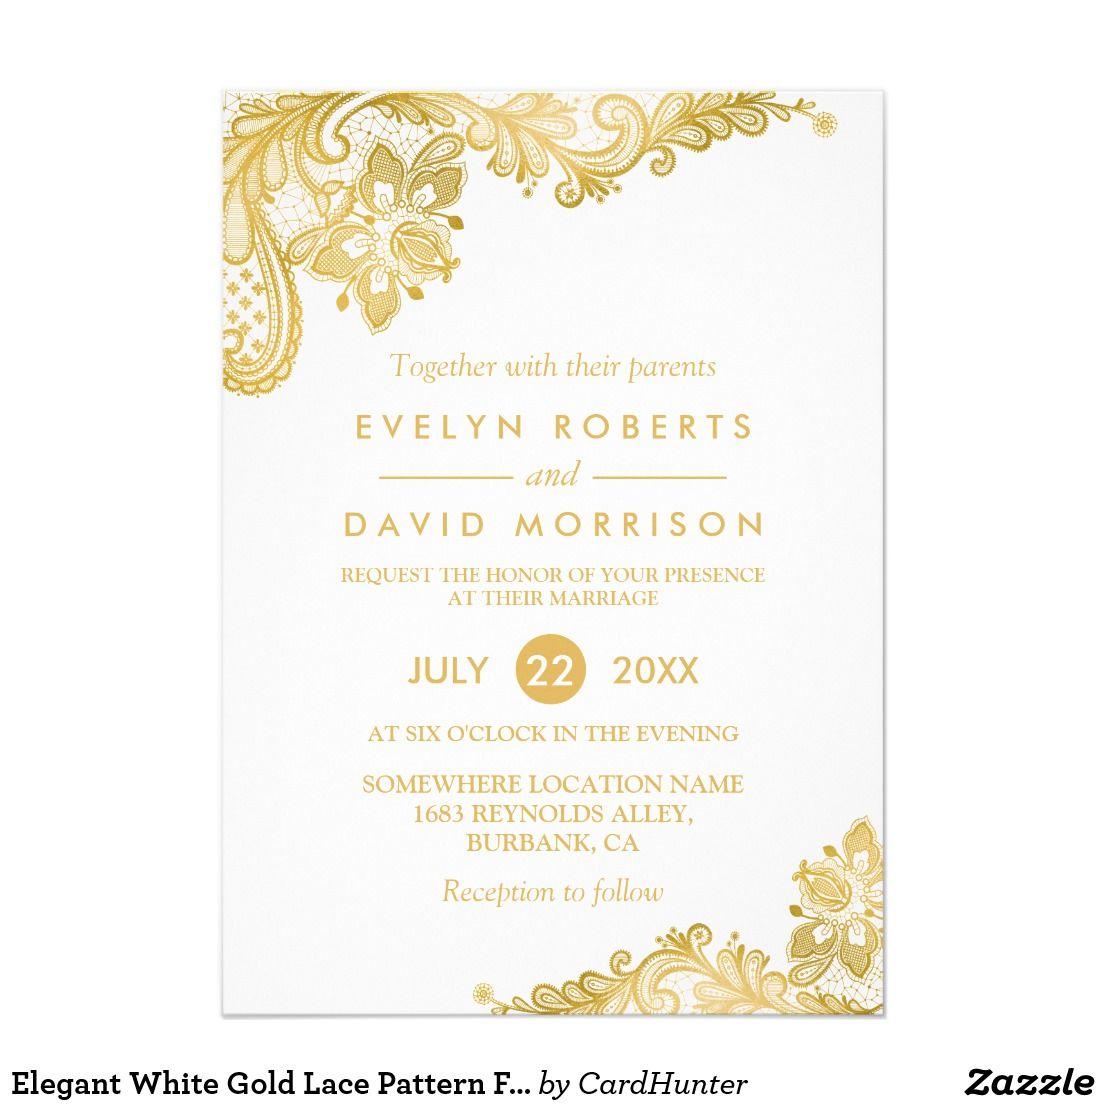 Elegant White Gold Lace Pattern Formal Wedding Invitation  Zazzle